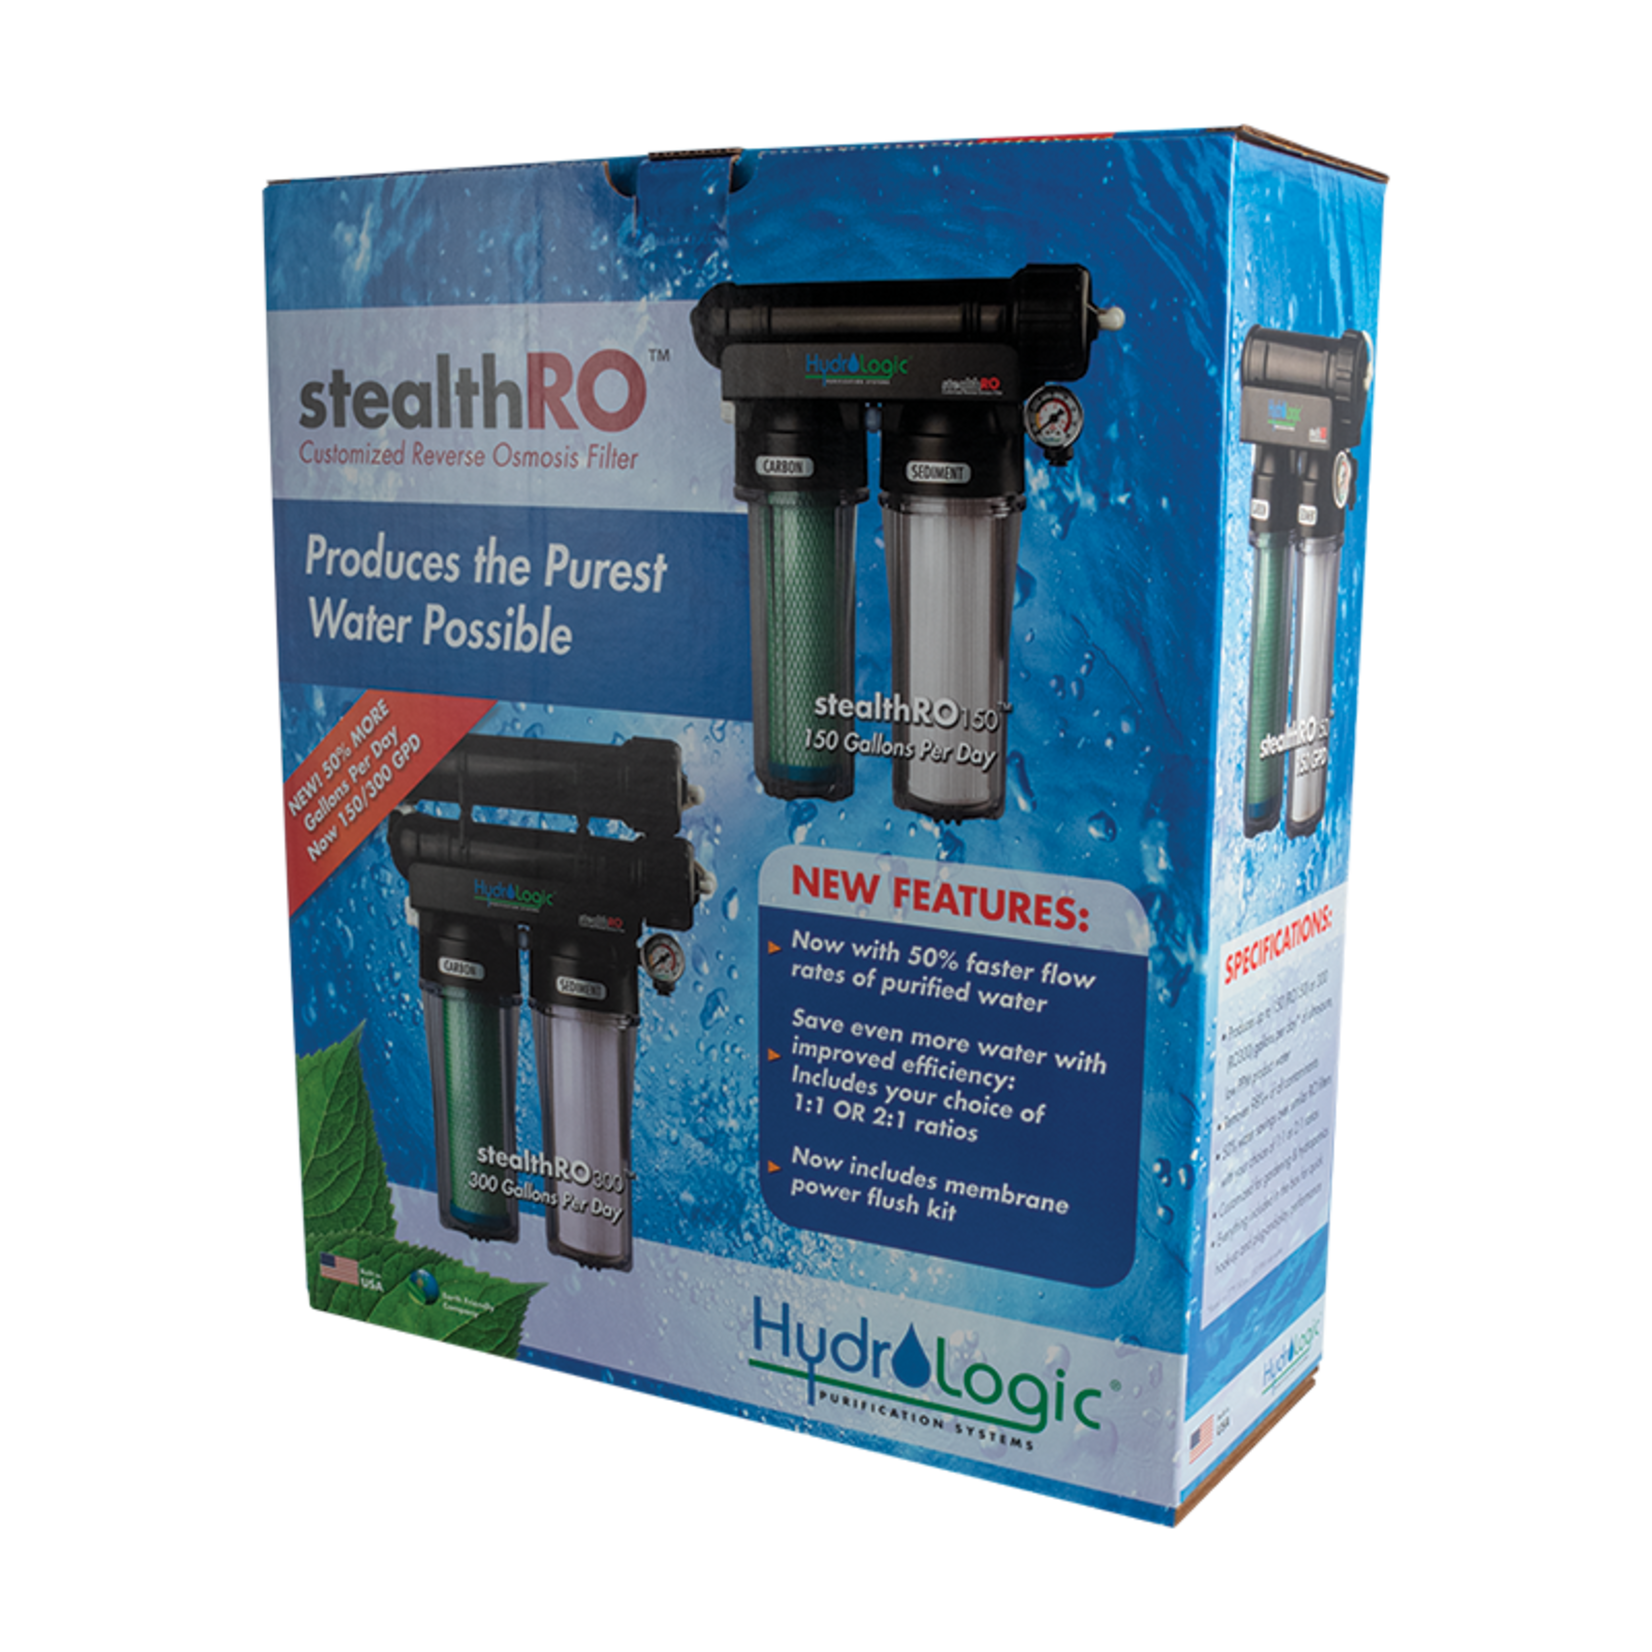 Hydrologic HYDROLOGIC STEALTH-RO150 GPD REVERSE OSMOSIS